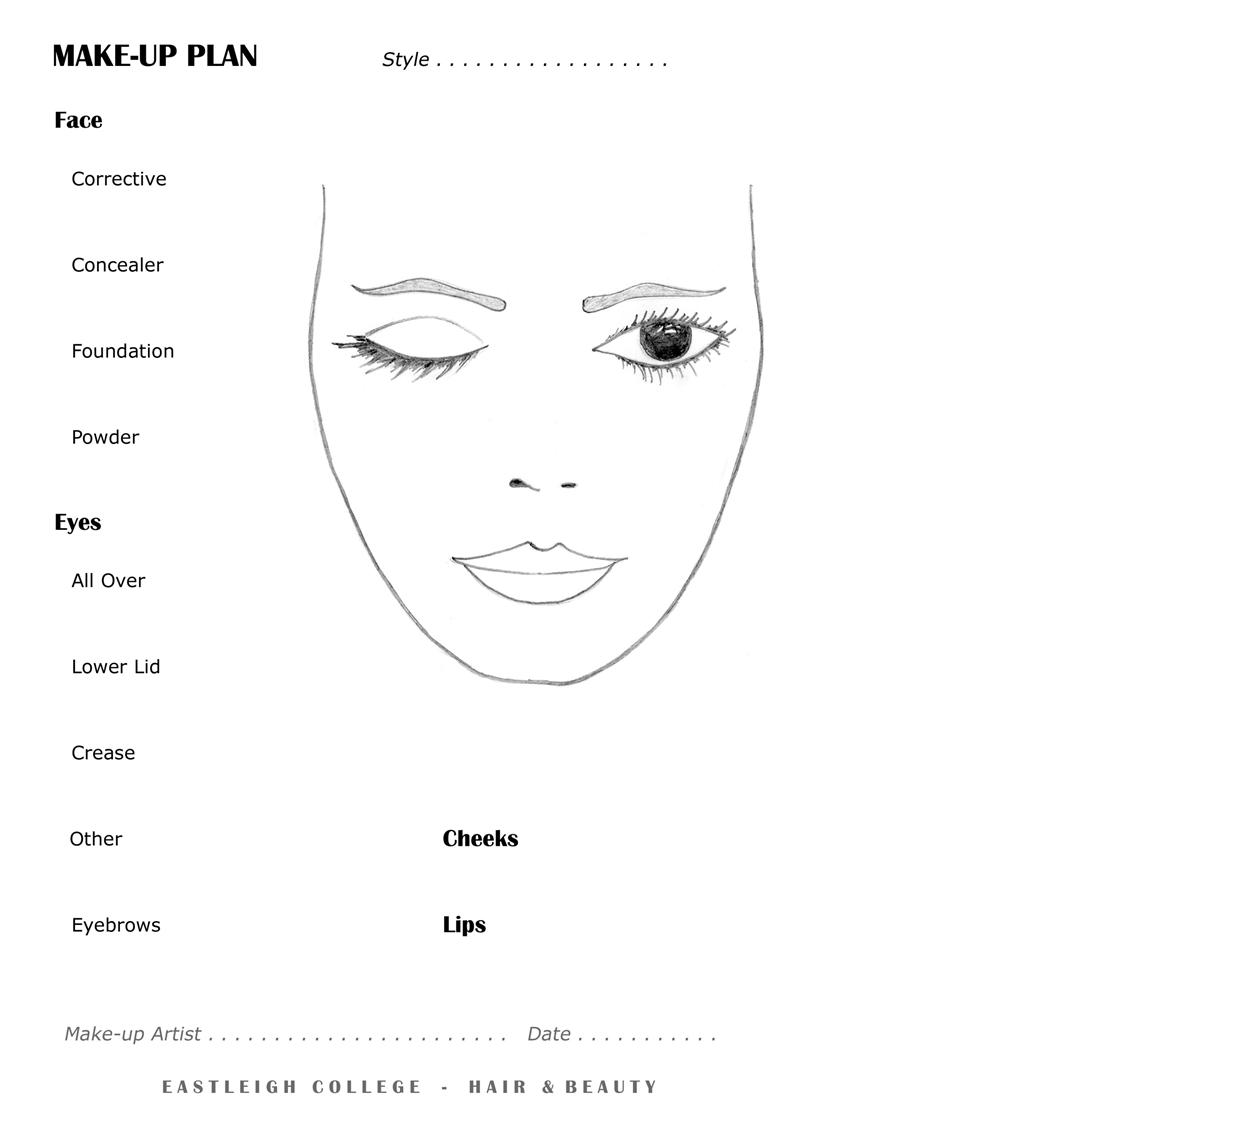 Xx Face Charts And Make Up Plans  Makeup Magic